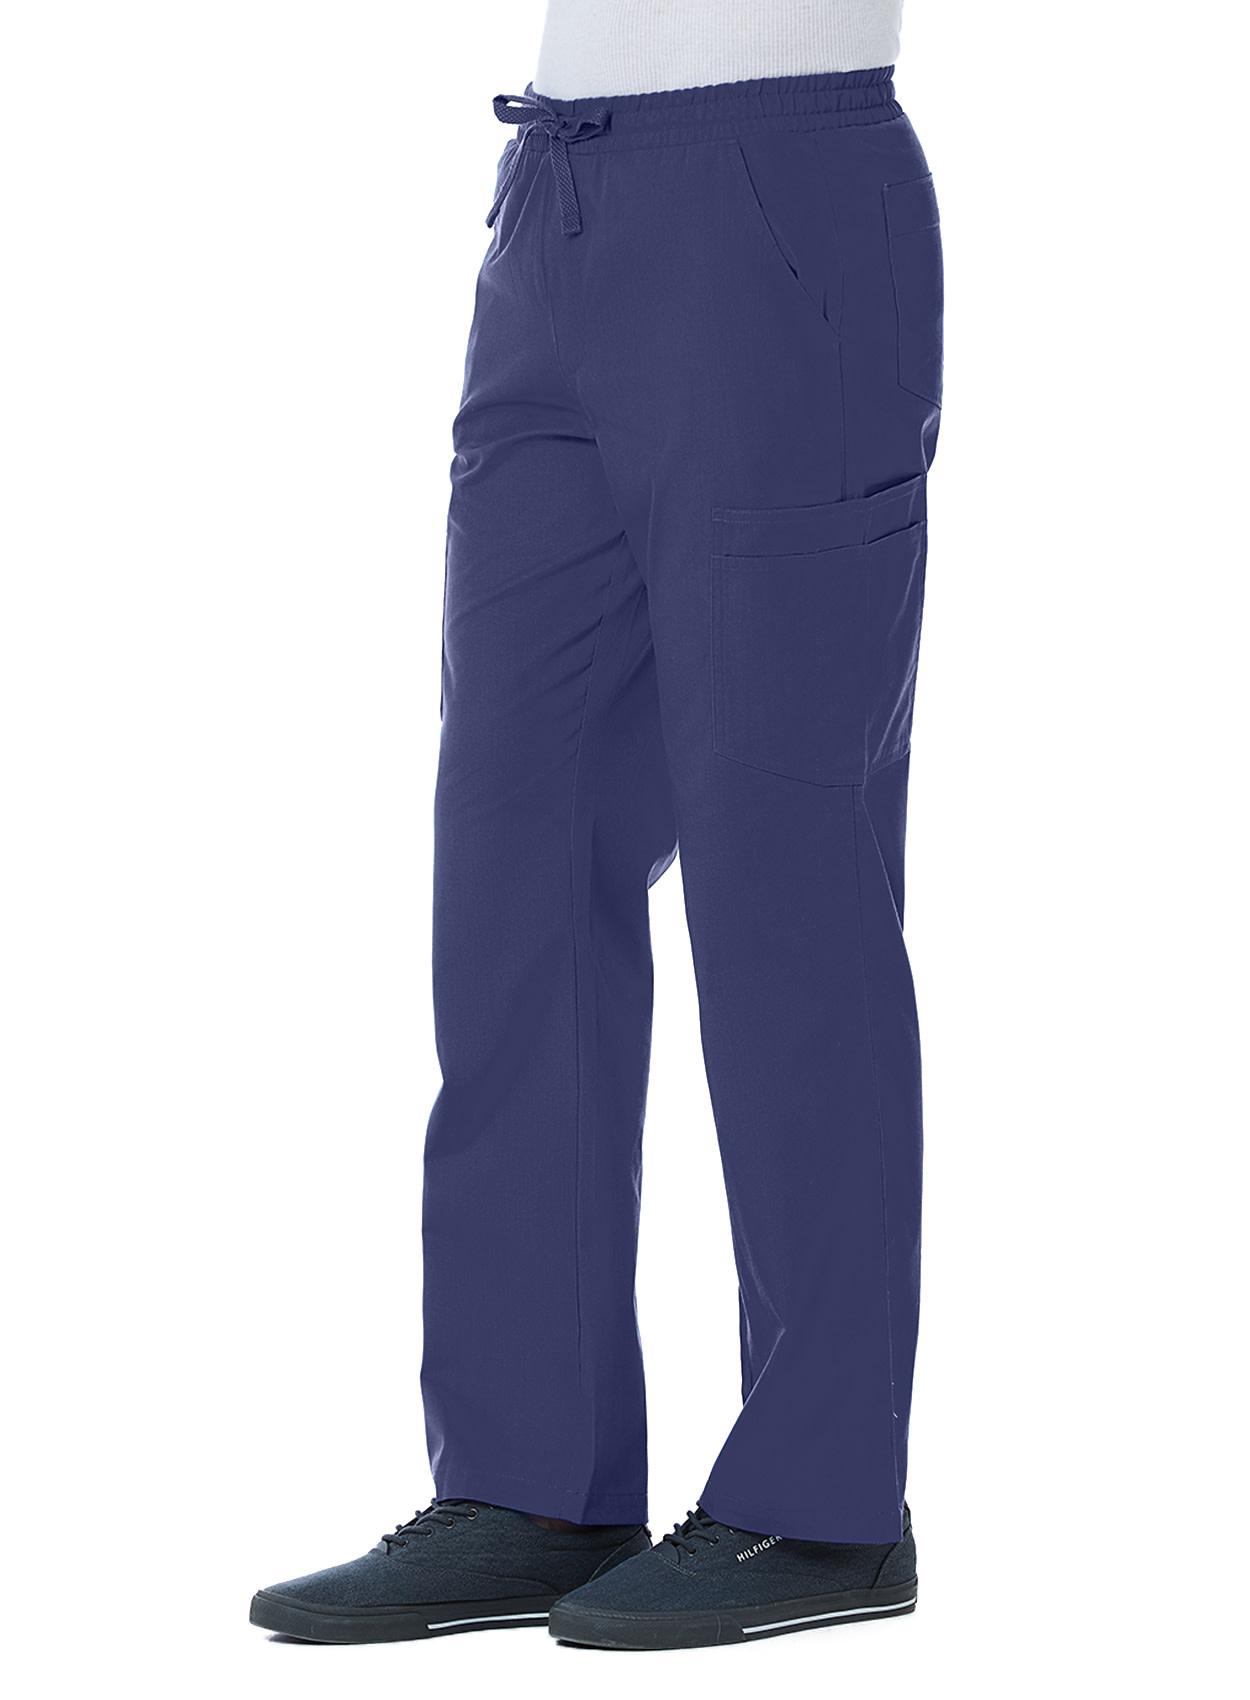 RED PANDA Navy Blue Men's Cargo Pants 8206T